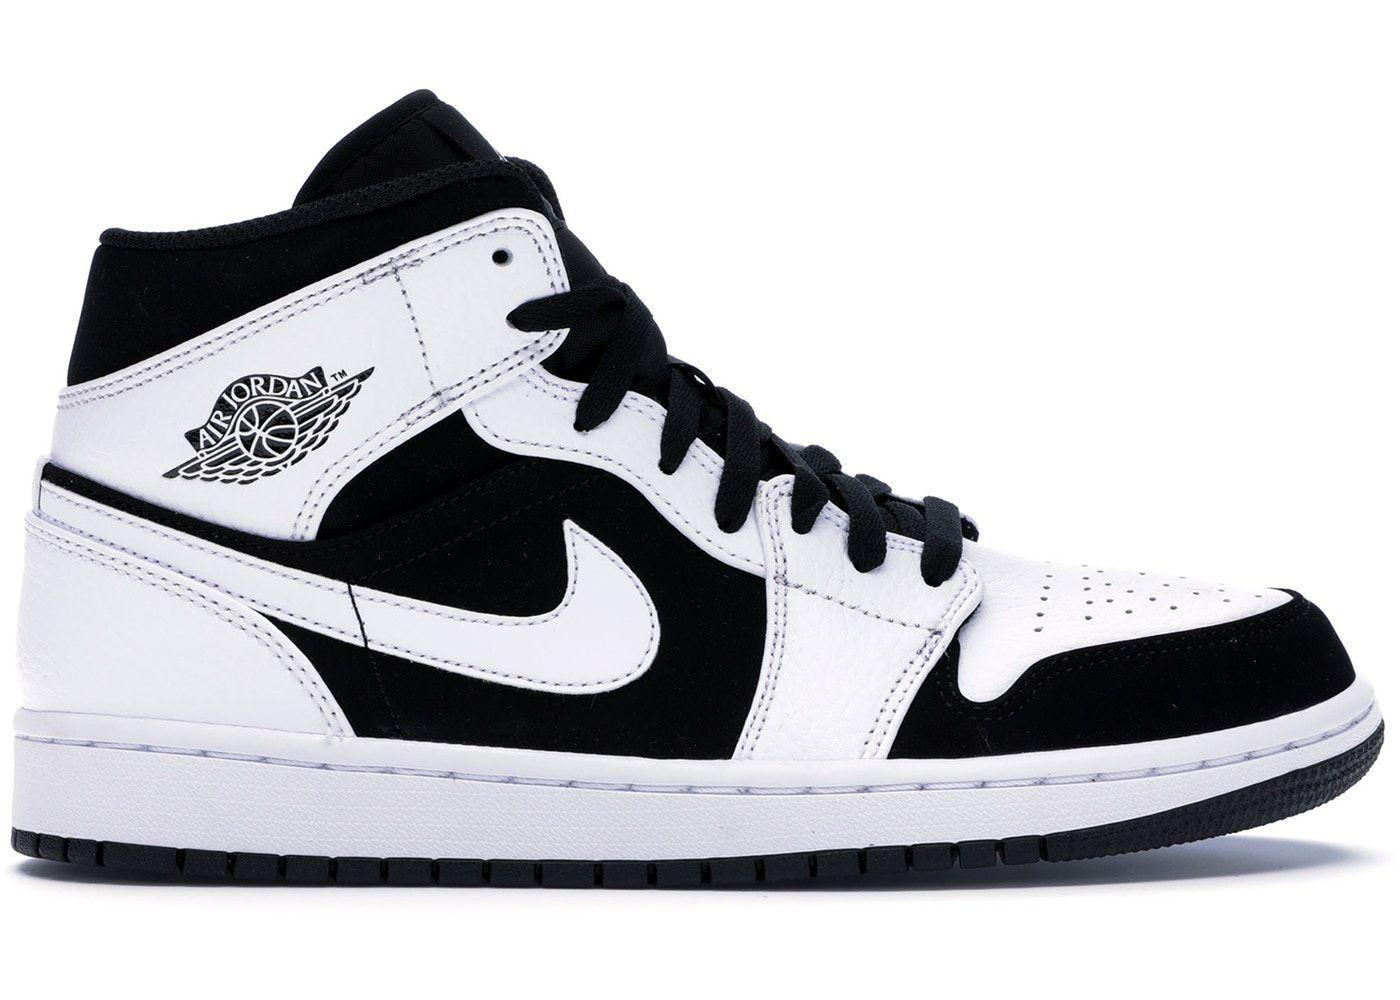 Jordan 1 Mid White Black Jordan 1 mid, Sneakers men